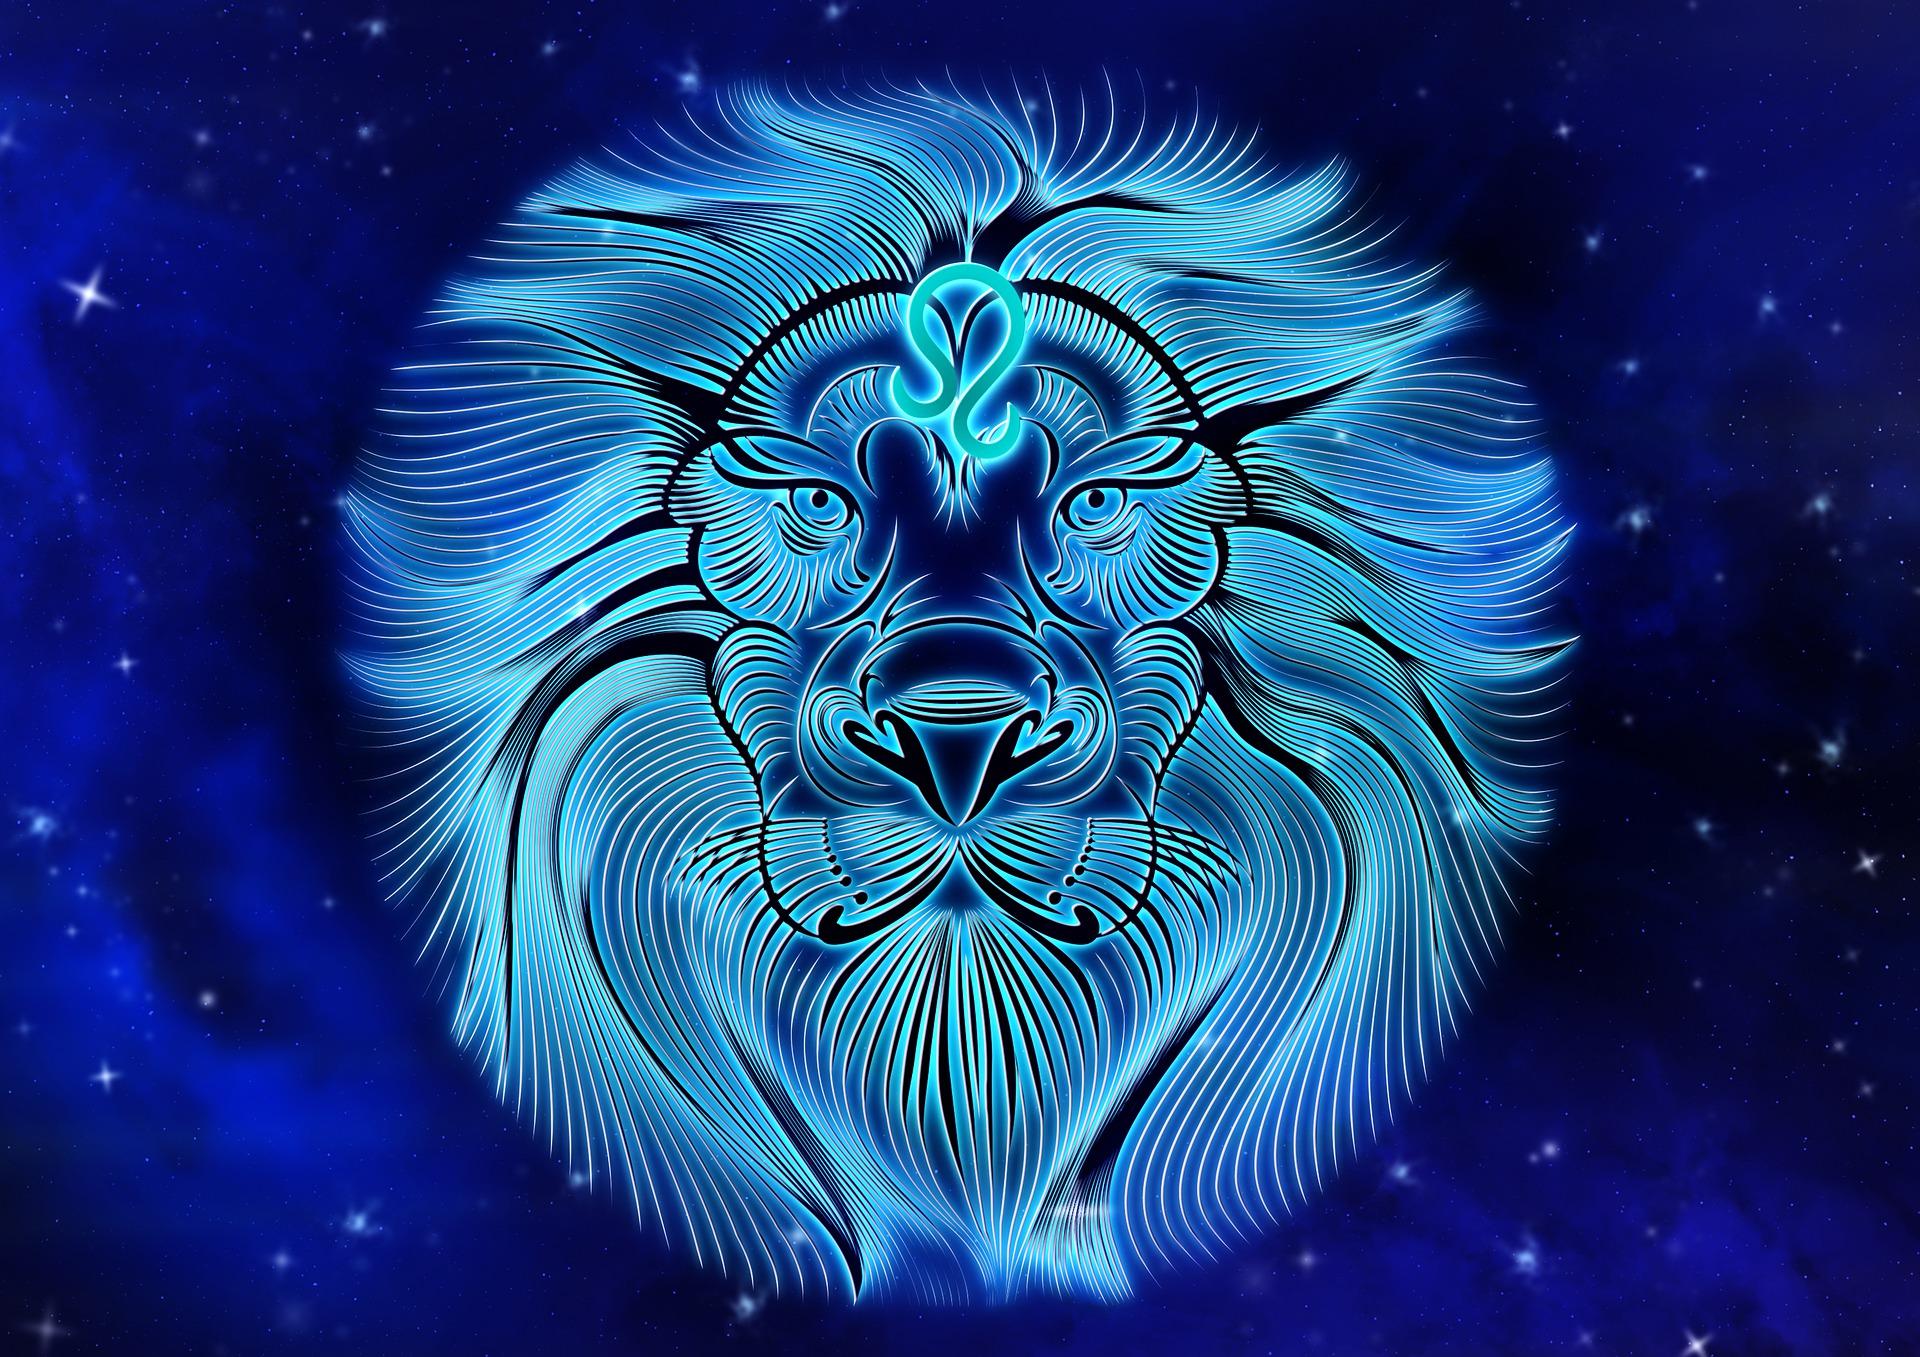 leo - ramalan kesehatan zodiak juli 2021